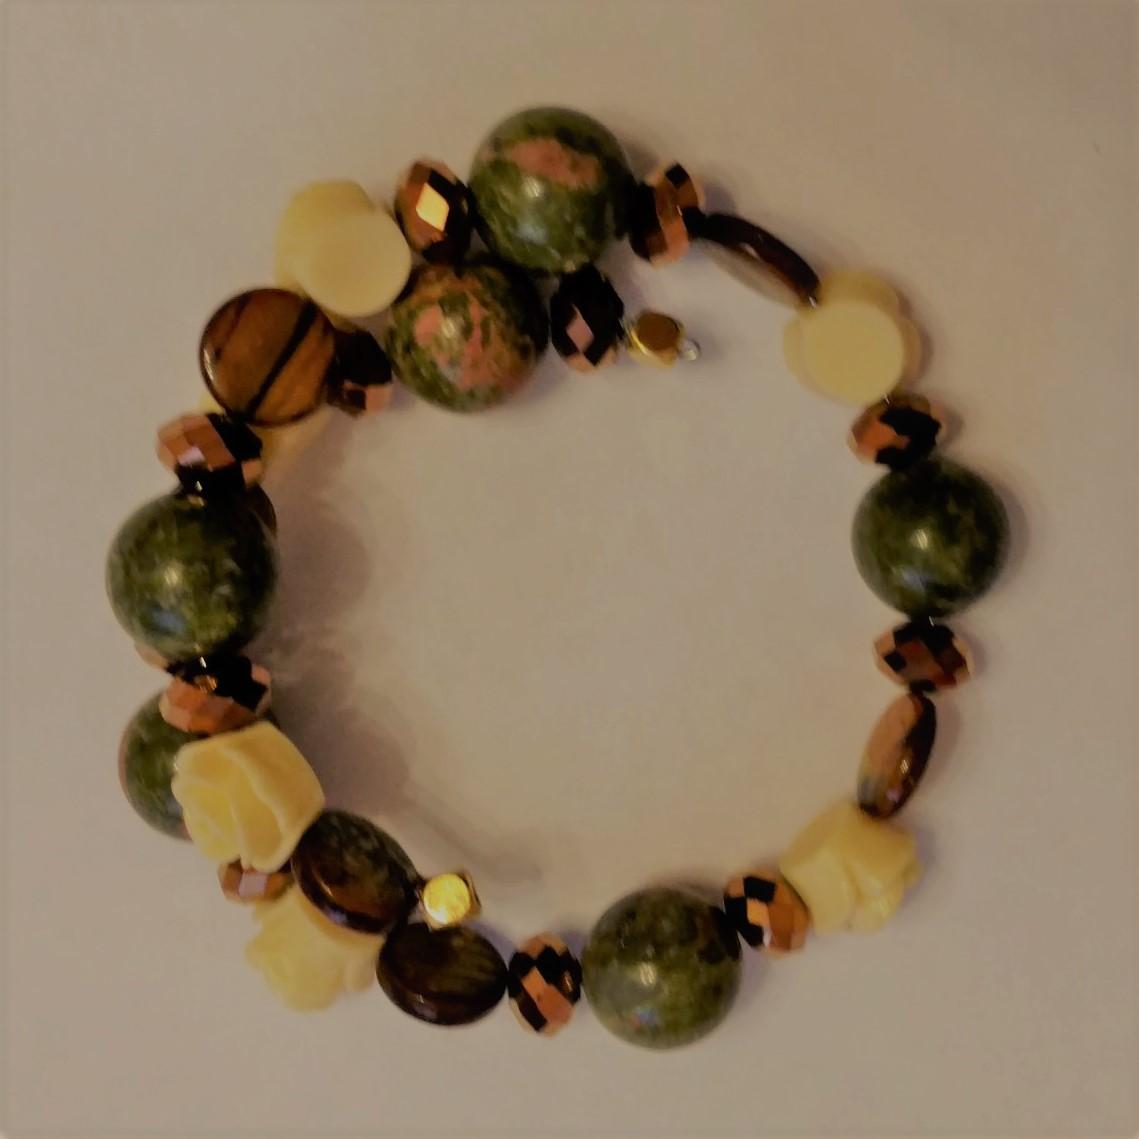 #L&L 181211 Bracelet  Suggested $20 USD